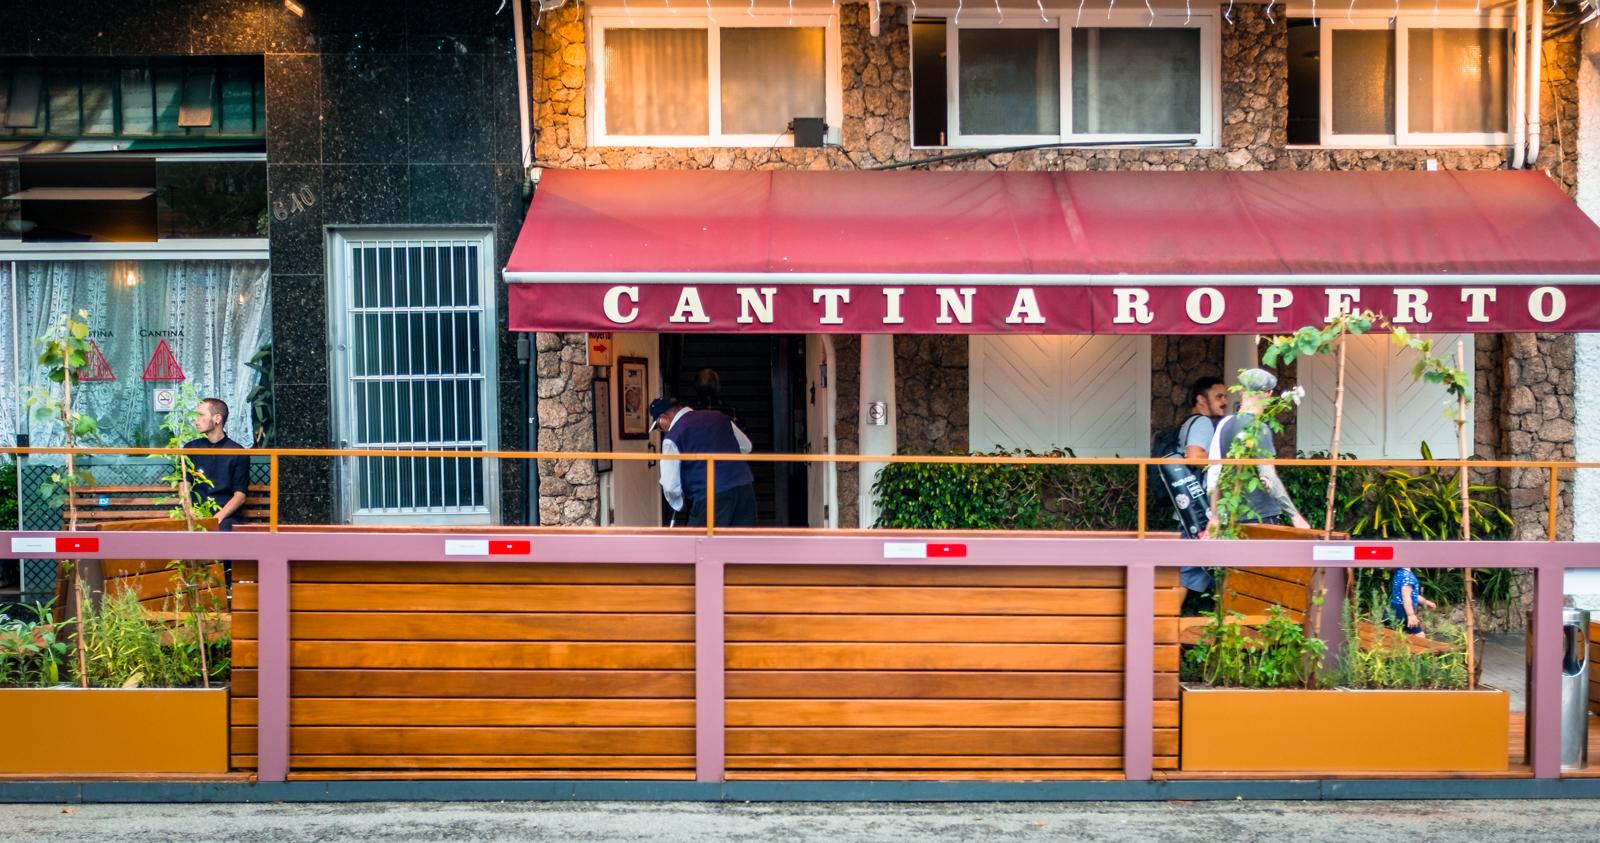 PARKLET CANTINA ROPERTO - RUA TREZE DE MAIO - FOTO 07 - HAA.JPG